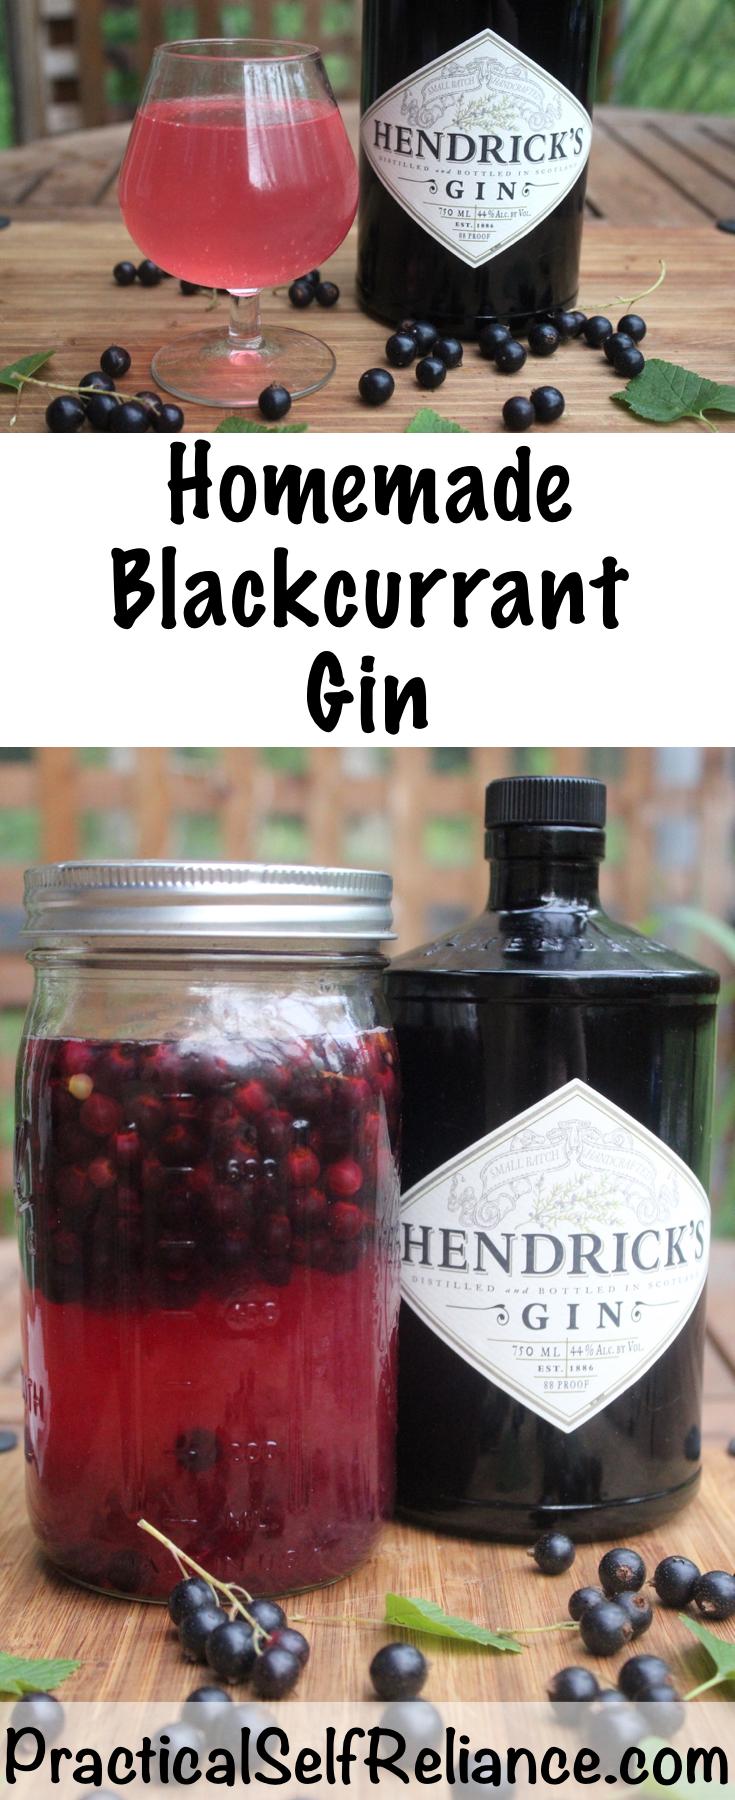 Homemade Blackcurrant Gin #currants #recipes #howtouse #blackcurrants #currant #gin #drinks #beverages #cocktail